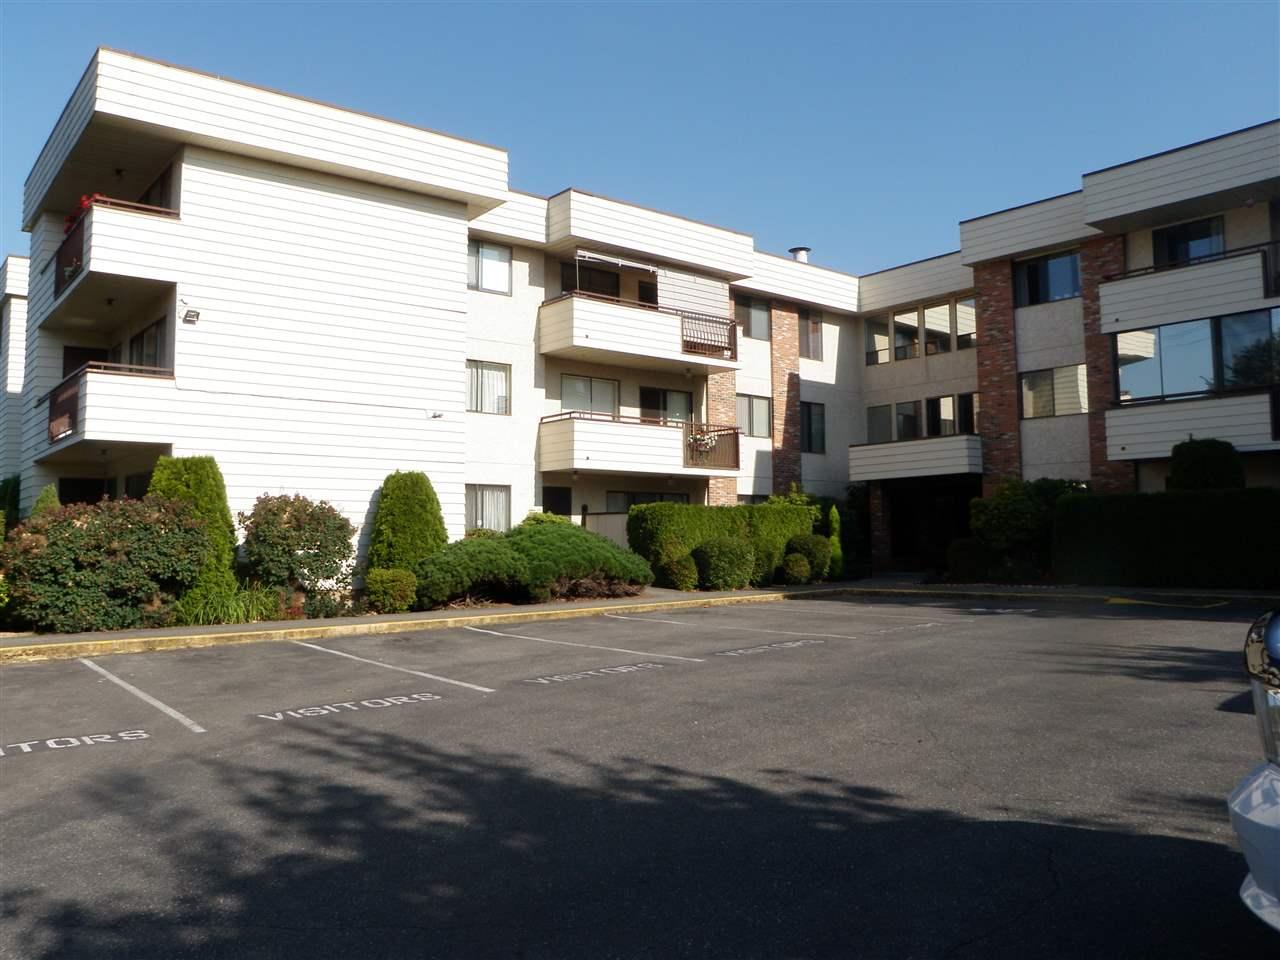 Condo Apartment at 306 32885 GEORGE FERGUSON WAY, Unit 306, Abbotsford, British Columbia. Image 1